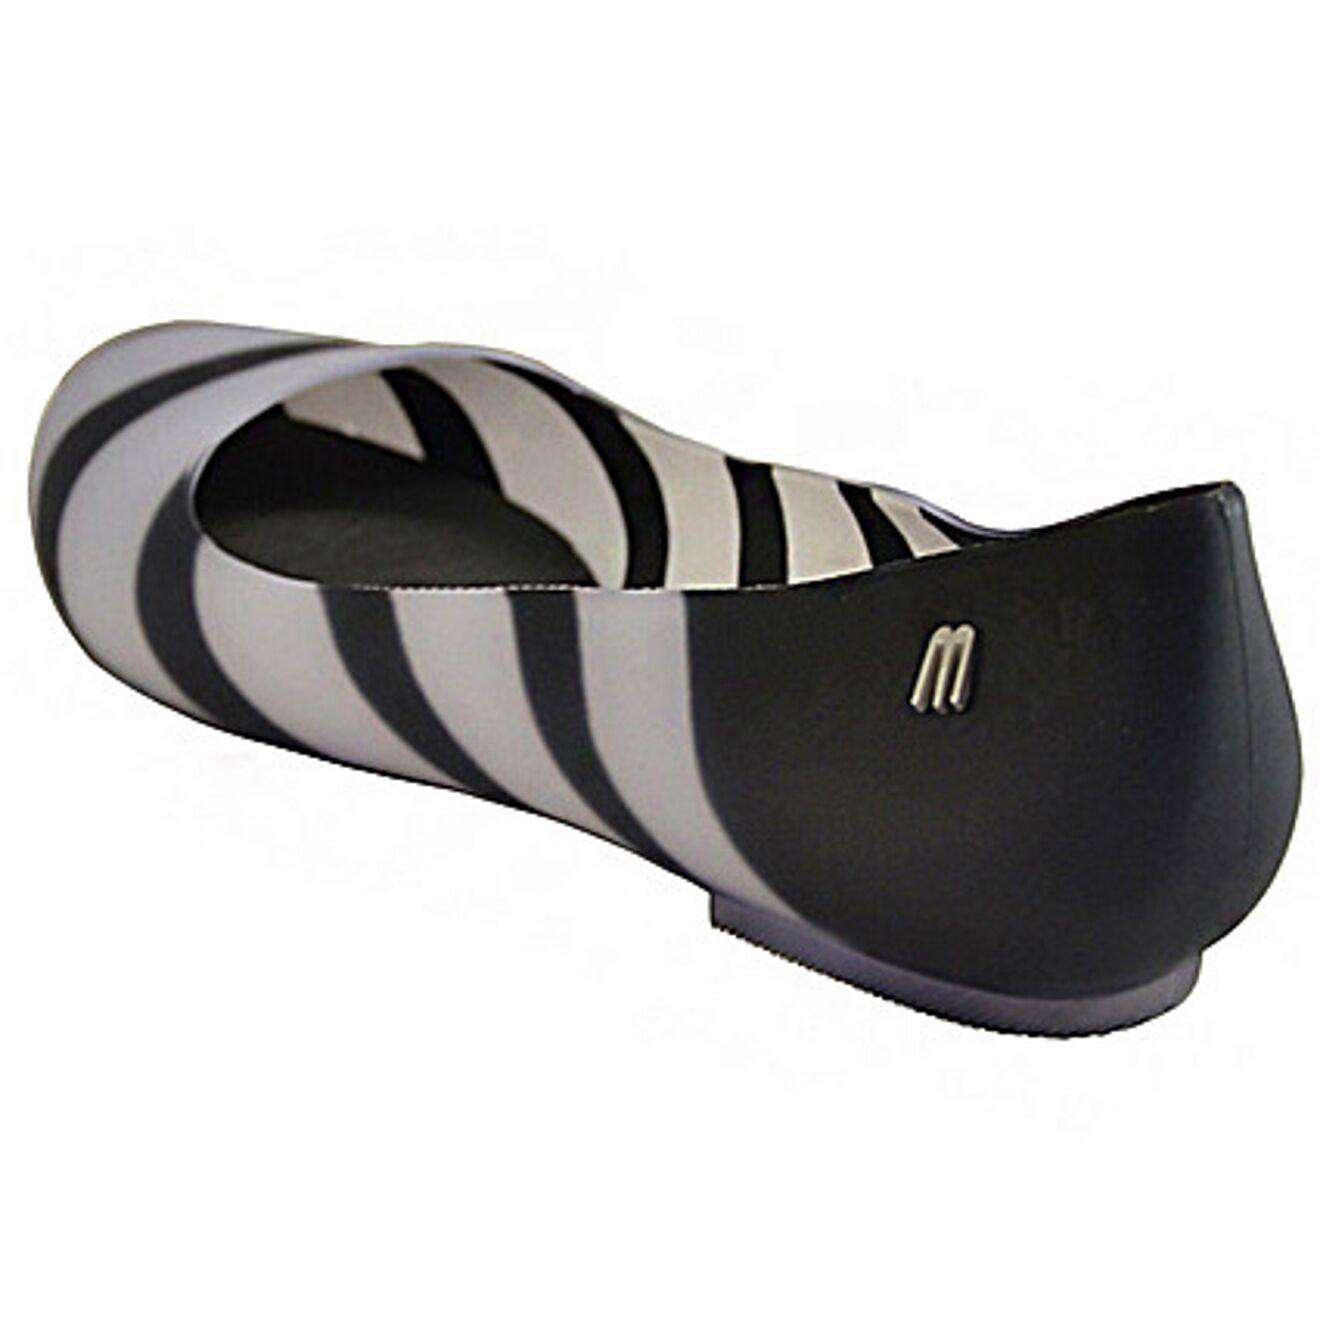 Melissa ballerine Divine optical righe, Divine optical striped, ballet flat